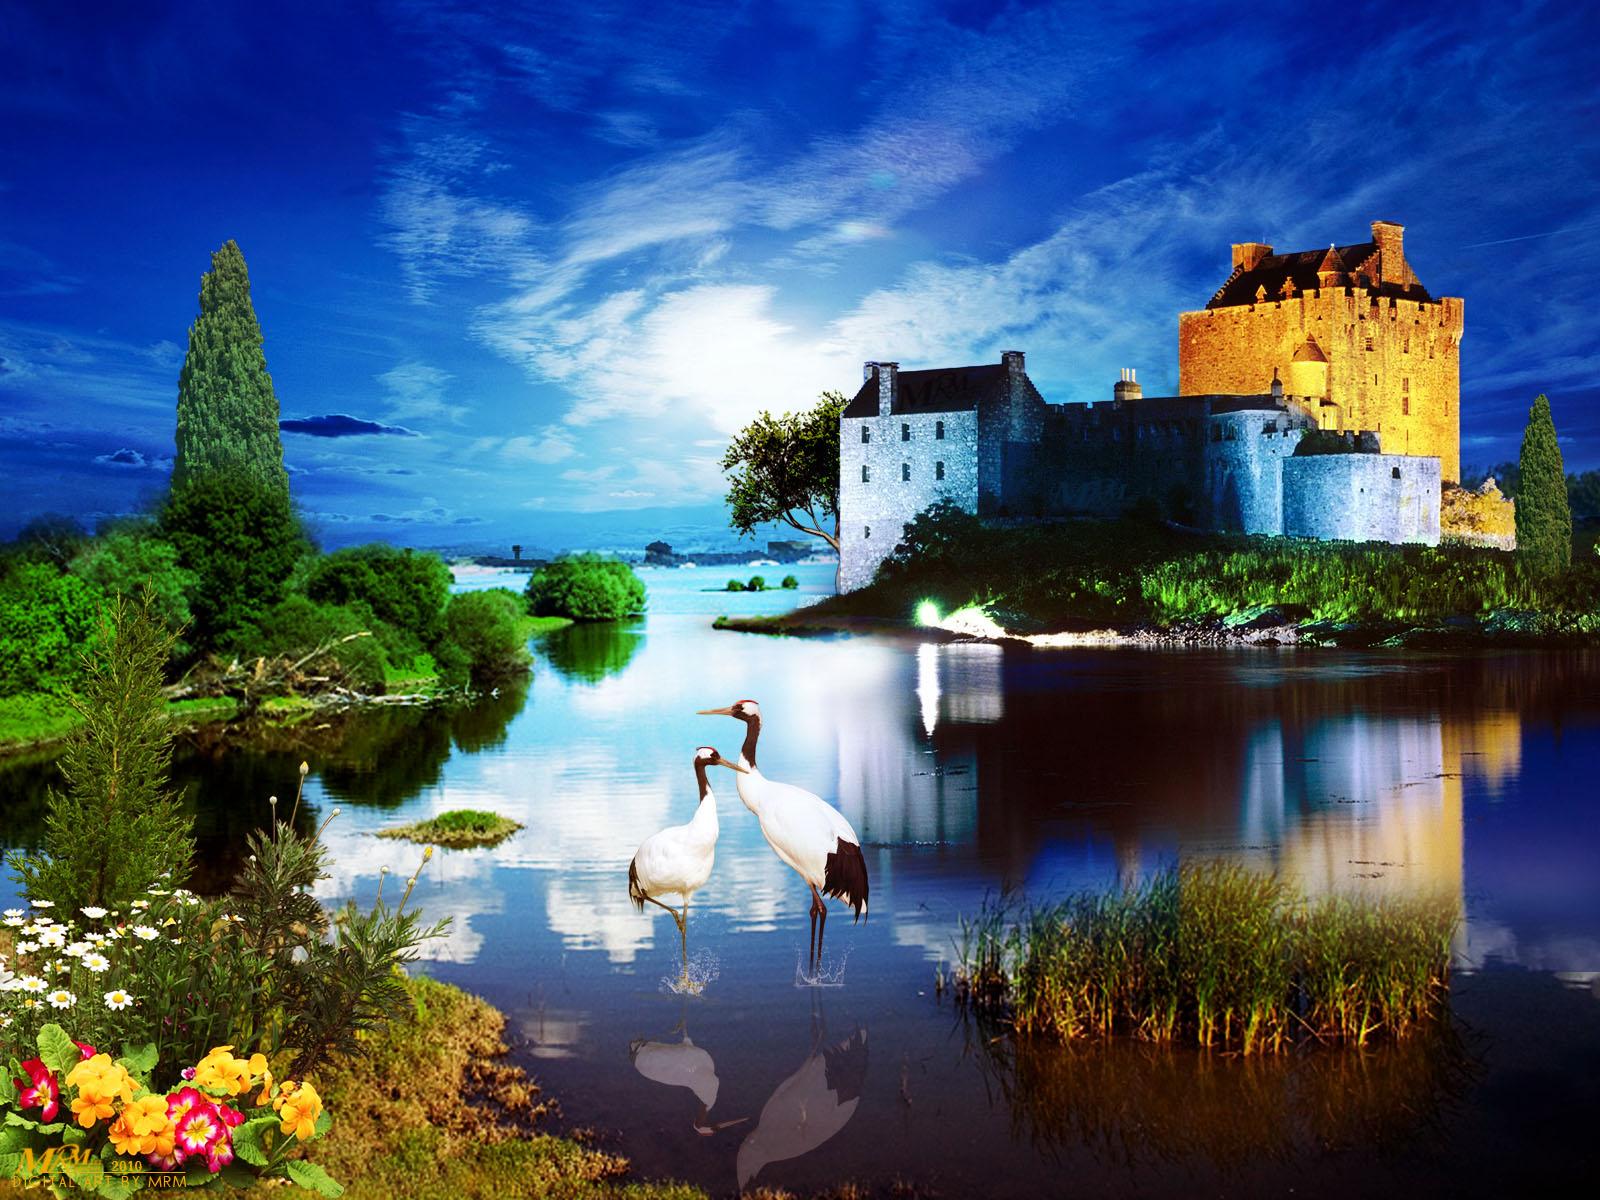 http://3.bp.blogspot.com/-kSwNYnEbMM4/TWHtct0RDRI/AAAAAAAANdo/-O1JuWGkBwo/s1600/Wallpaper-Eilean%2BDonan%2BCastle-Scotland-Photo%2BManipulation-By%2BMrm.jpg